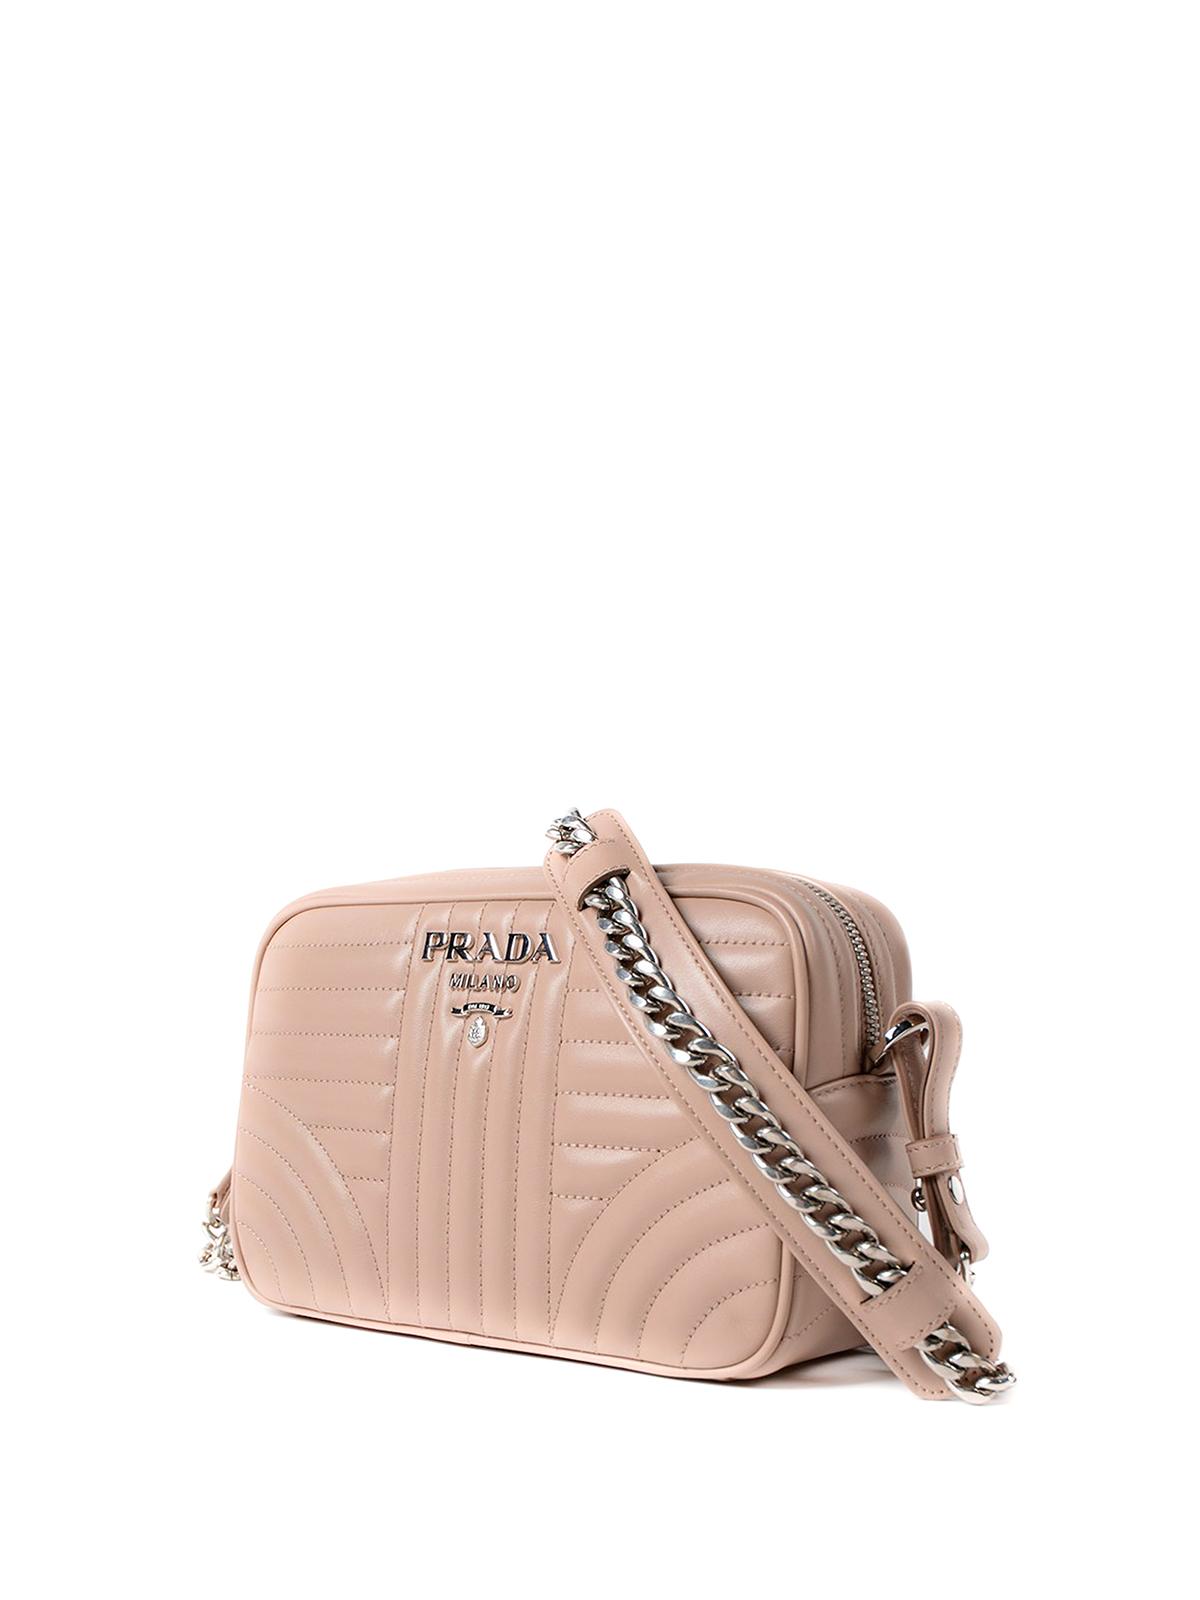 24983bbec0c0 Prada - Diagramme leather bag - cross body bags - 1BH0832D91VCOI236